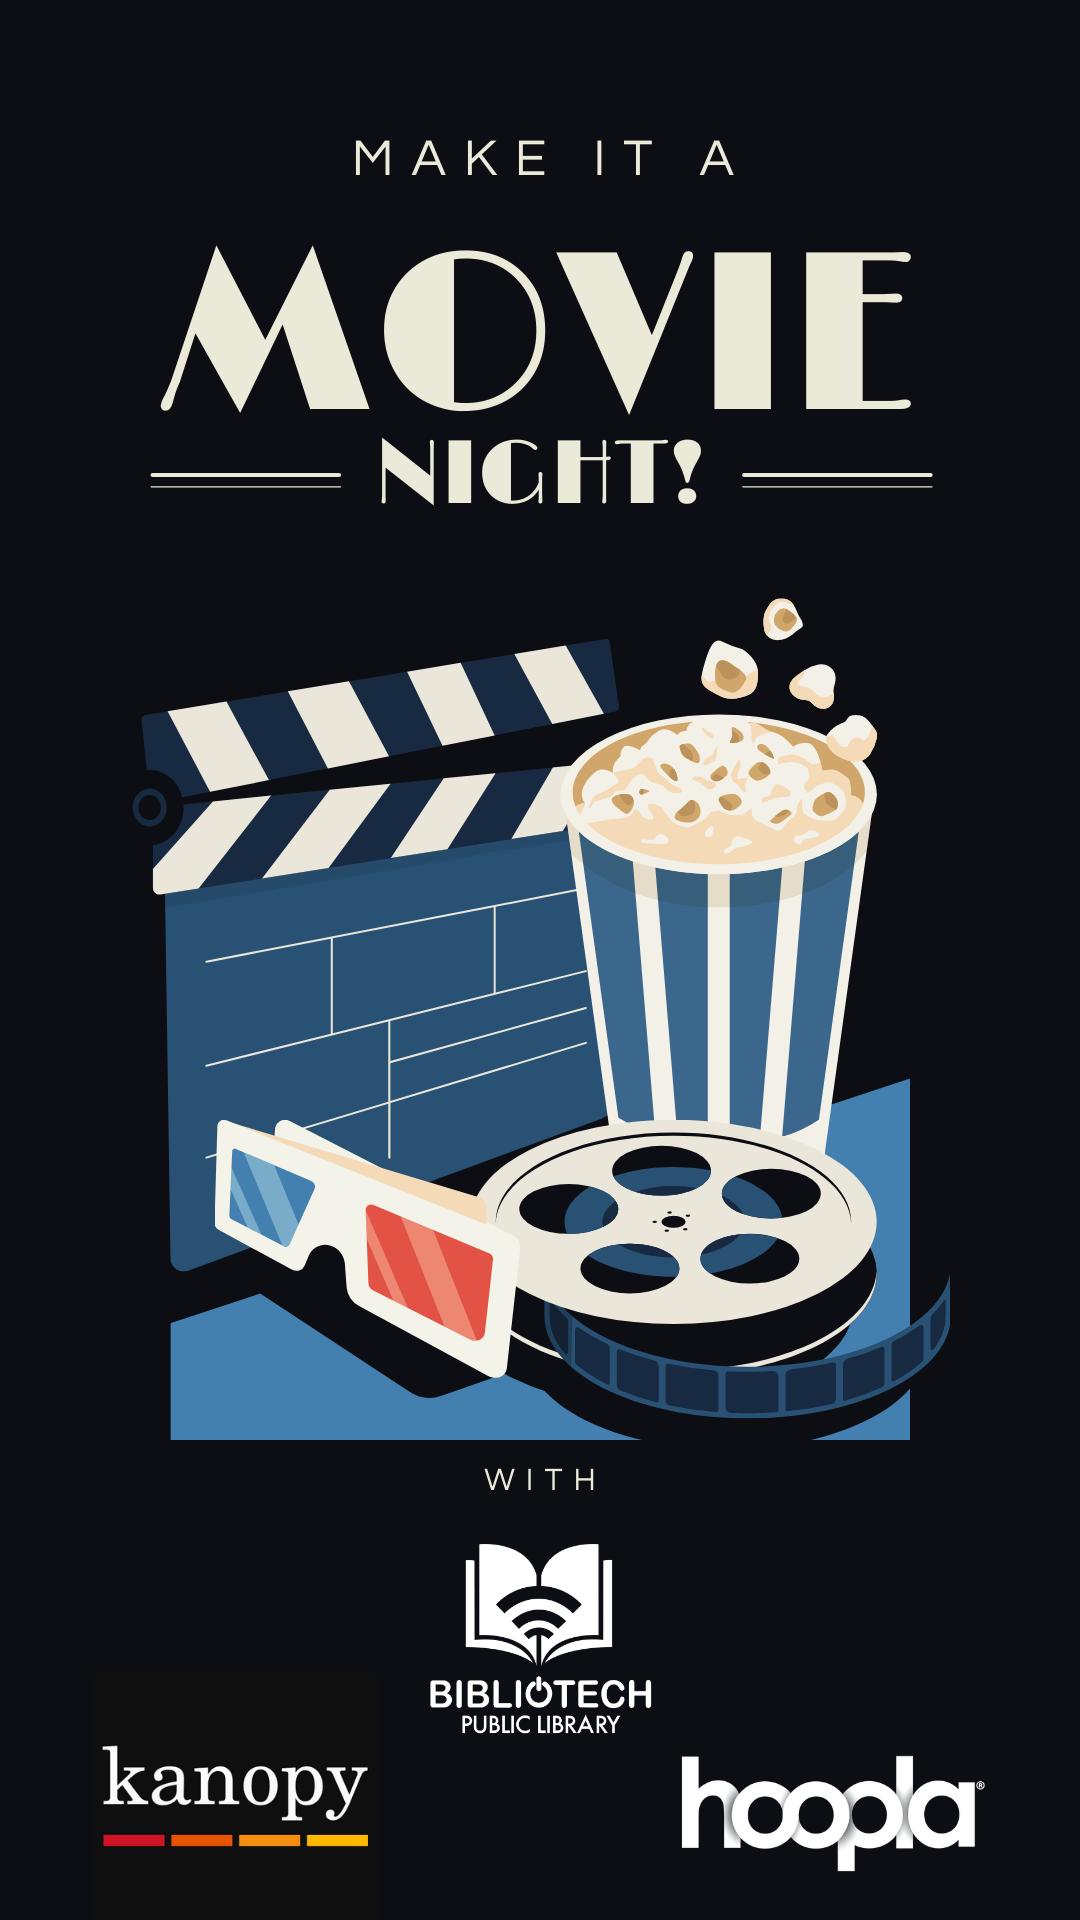 Make it a Movie Night!